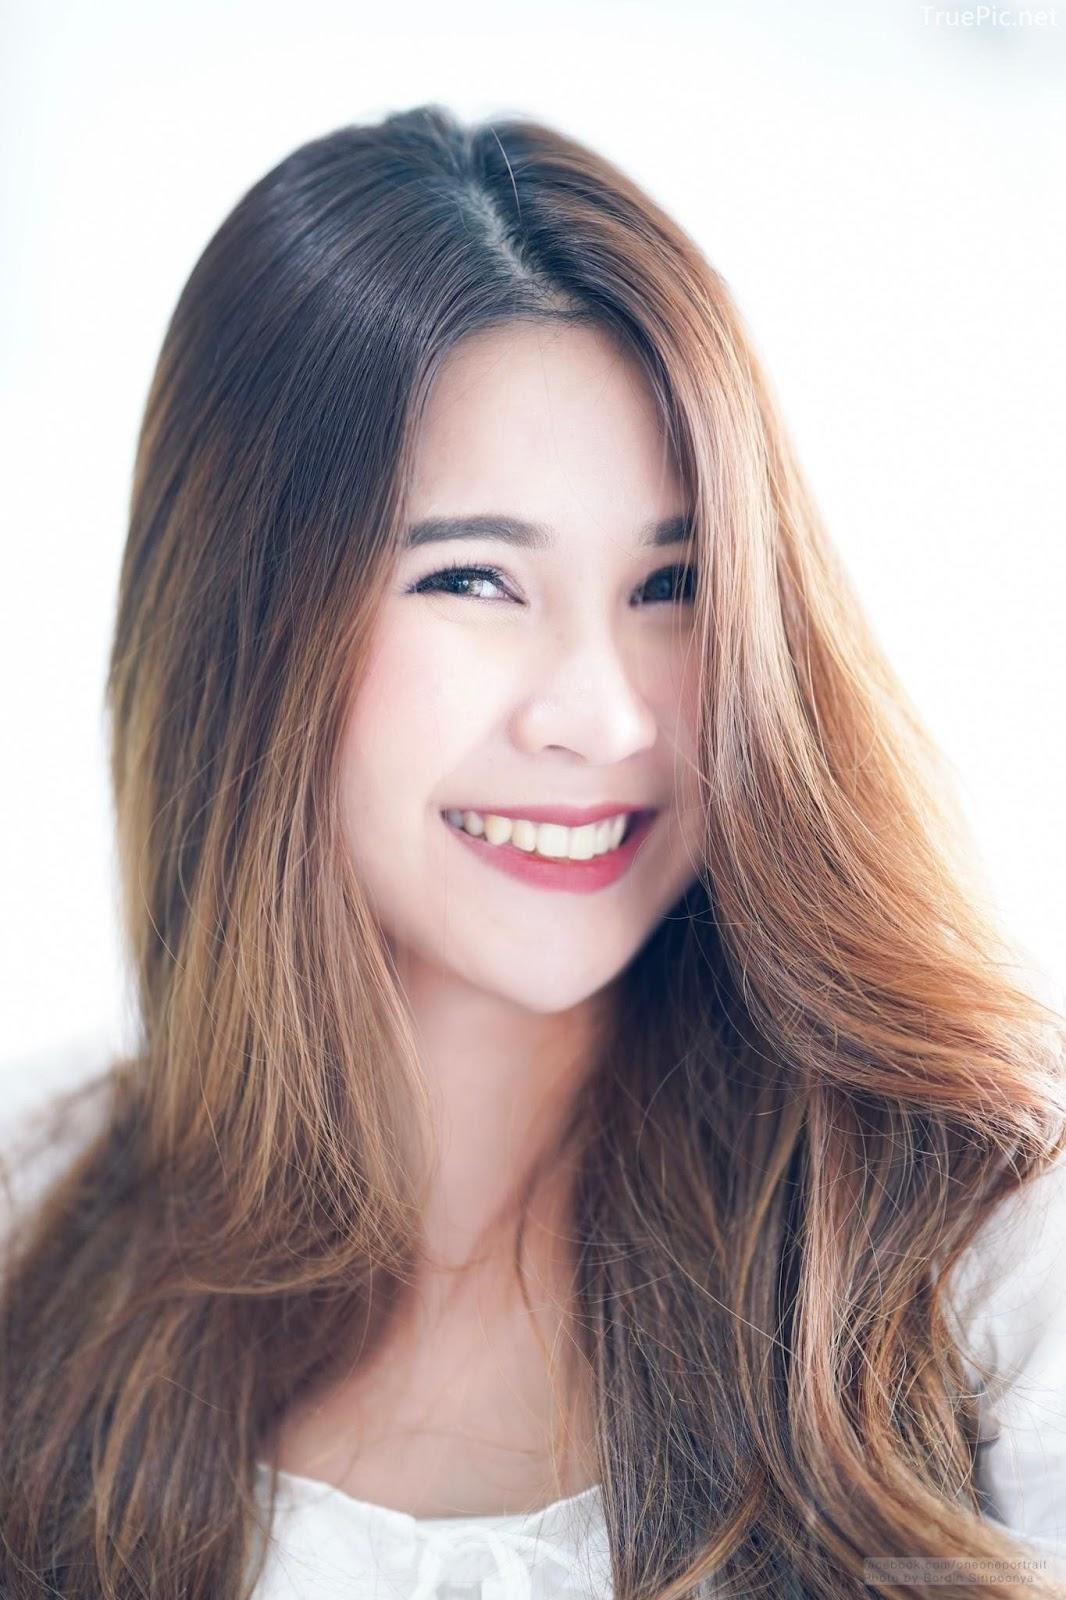 Thailand cute model Supansa Yoopradit (Lorpor) - Lovely smile girl - Picture 1